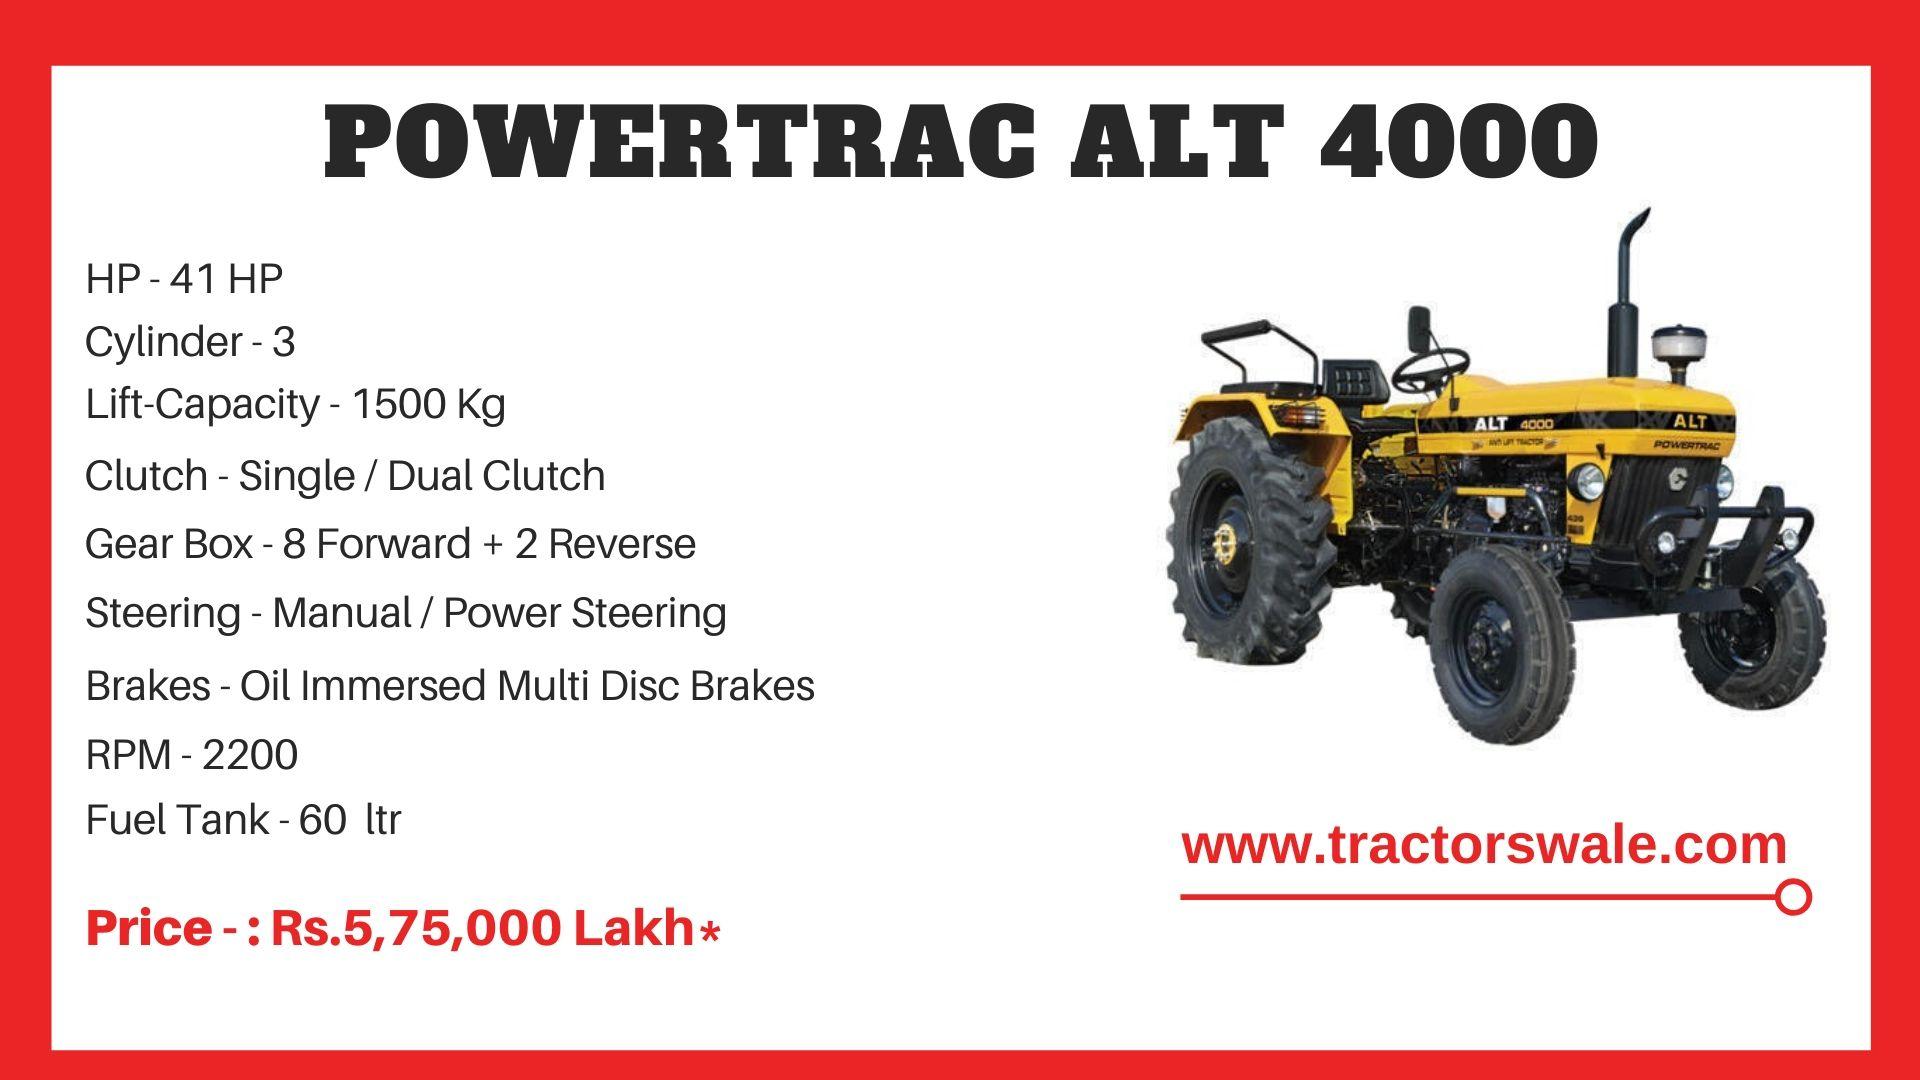 PowerTrac ALT 4000 tractor price